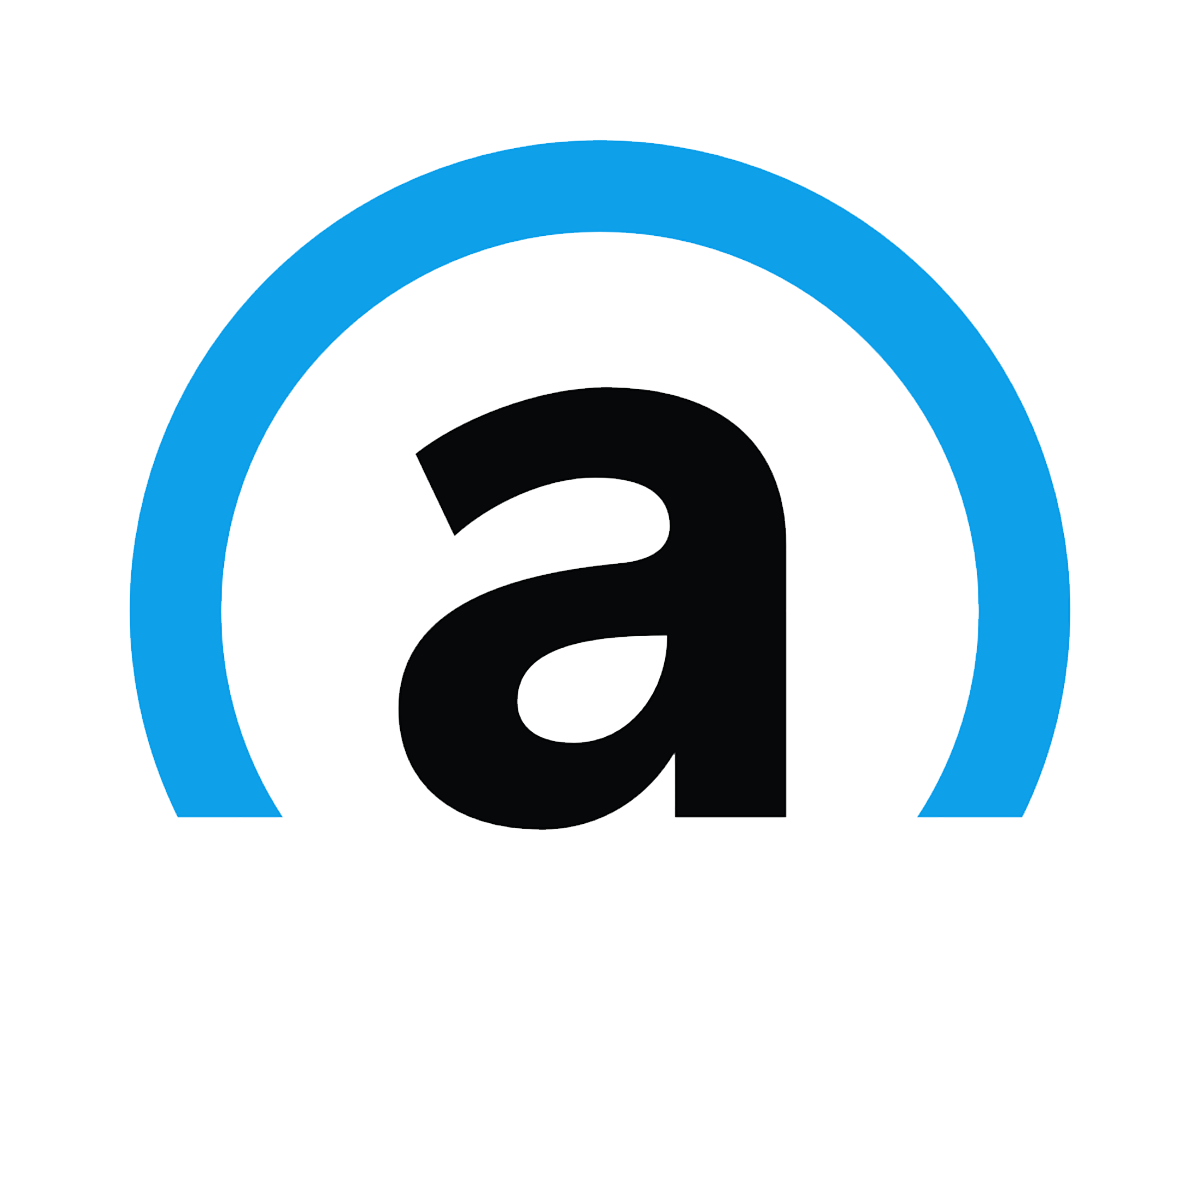 IPO компанії Affirm Holdings Inc (AFRM)